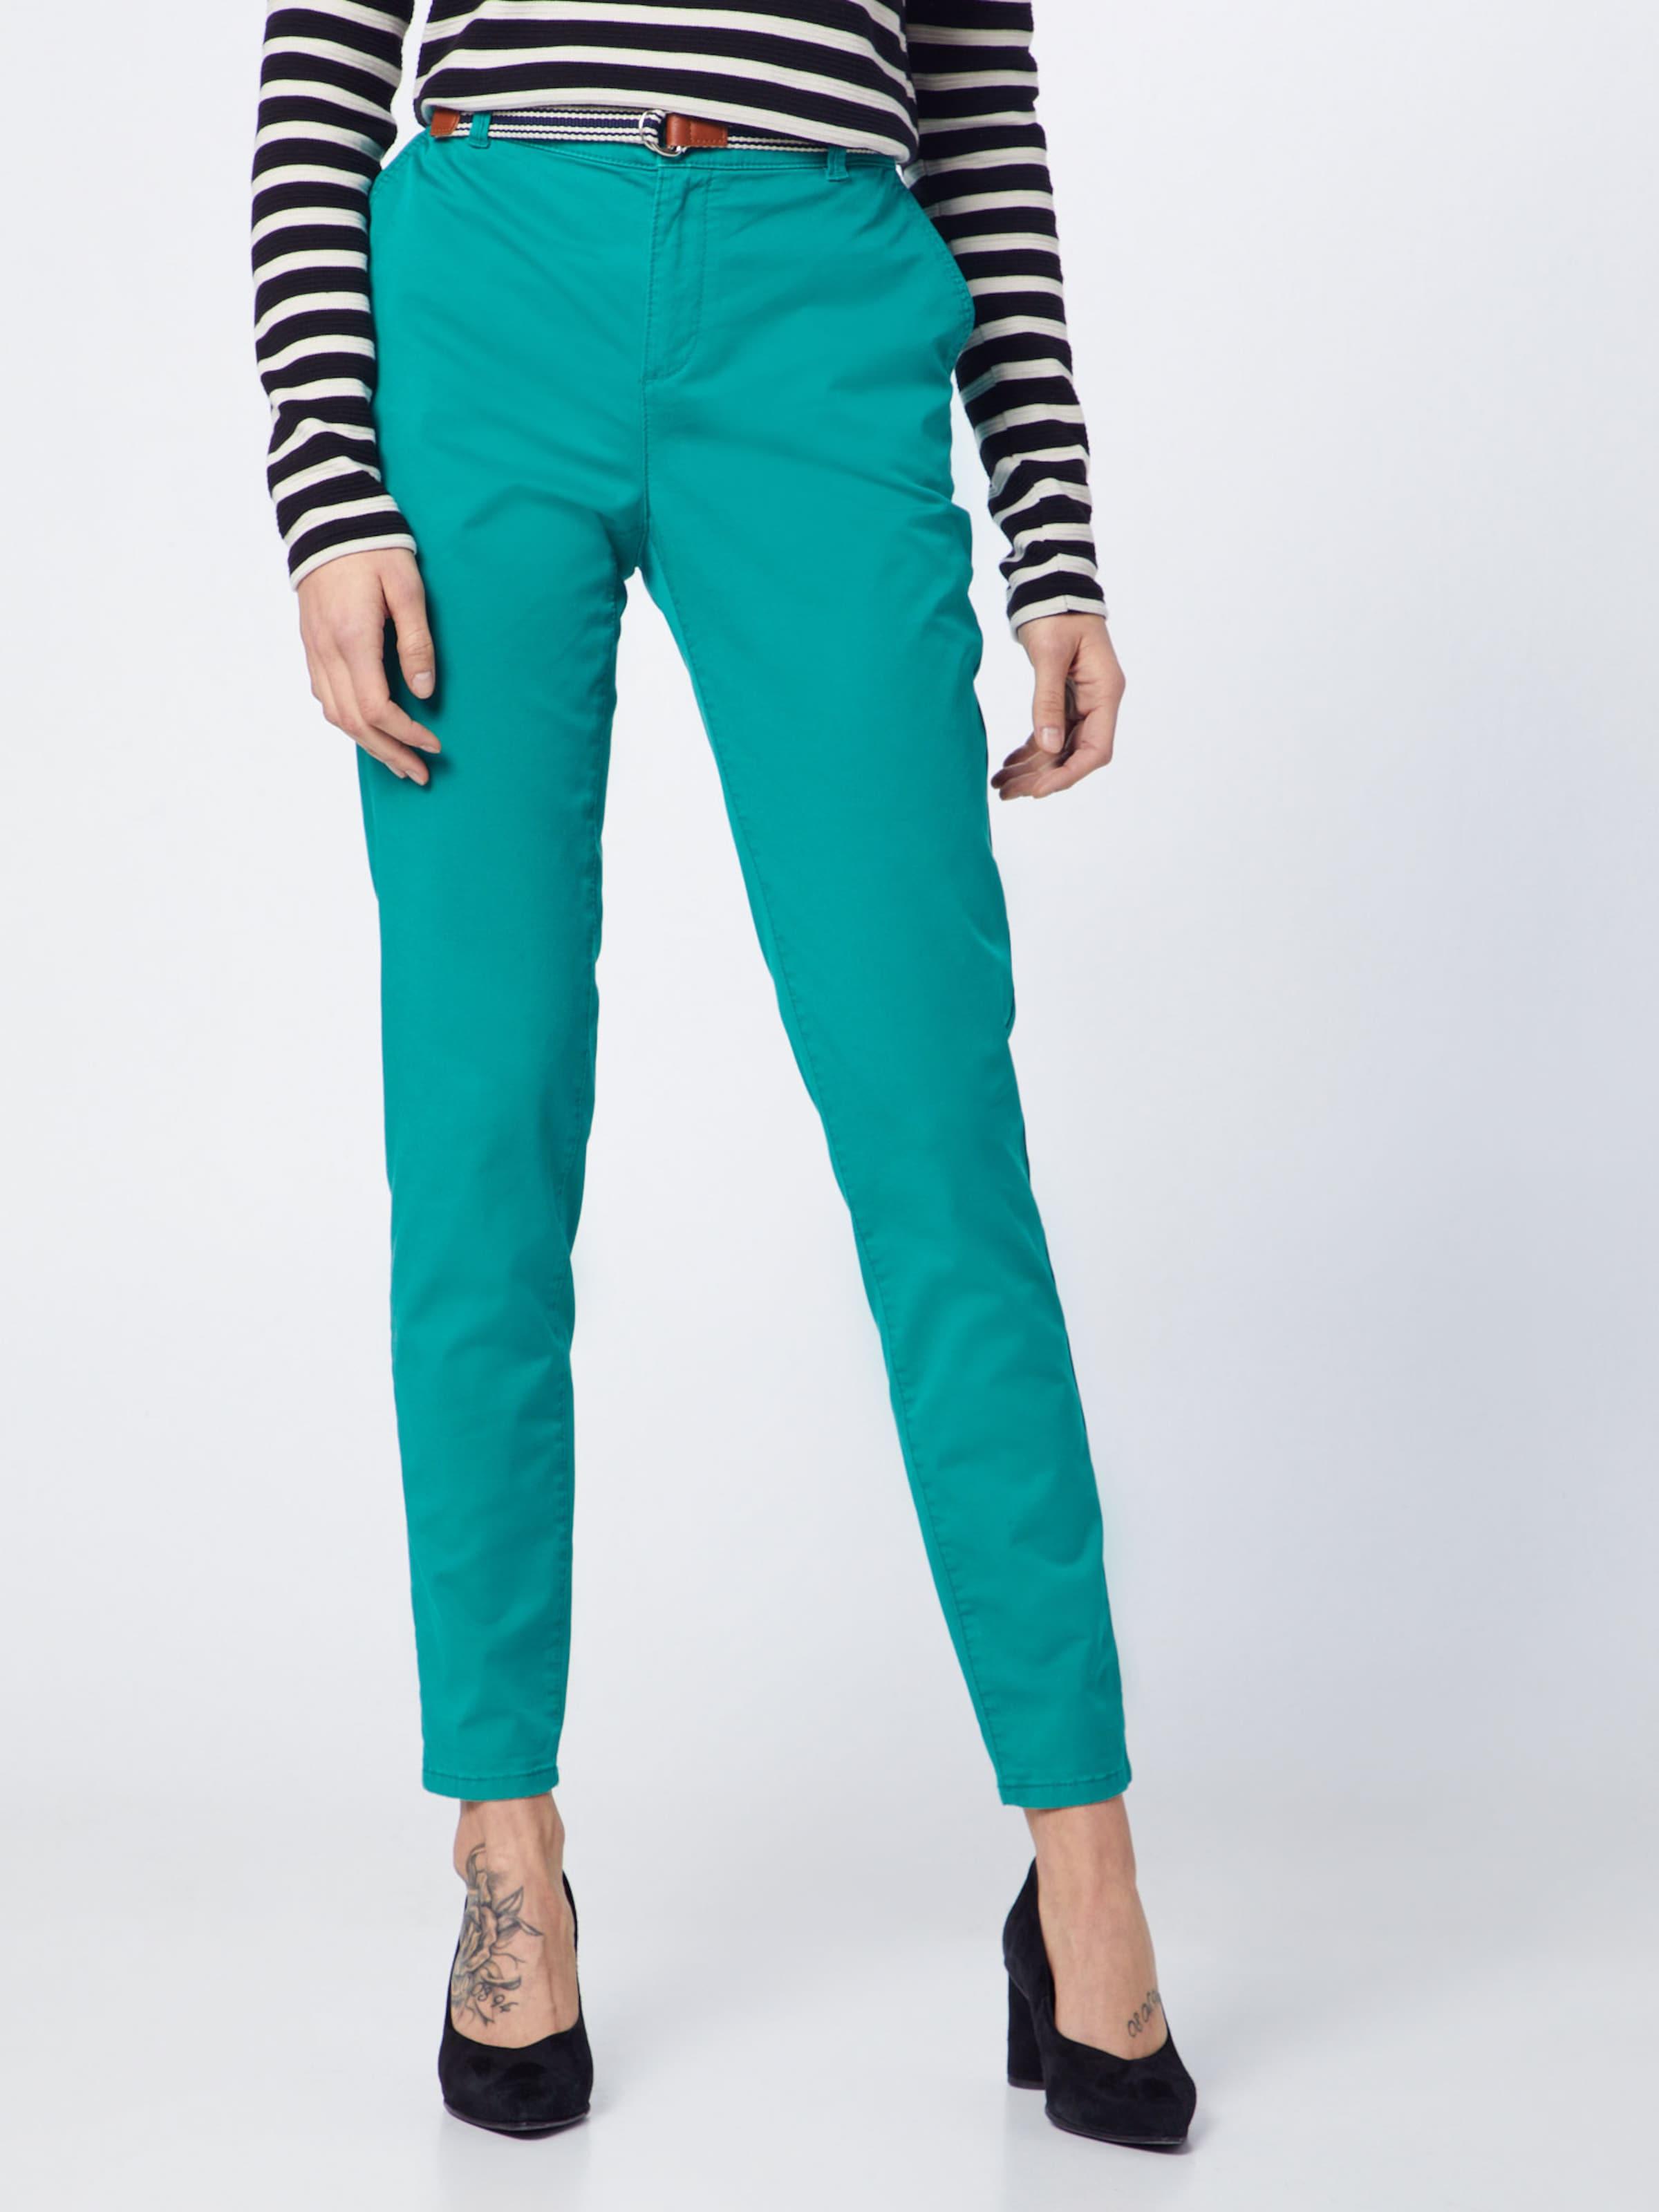 Esprit Jade Pantalon Chino Chino En Pantalon Esprit En 34RjAL5